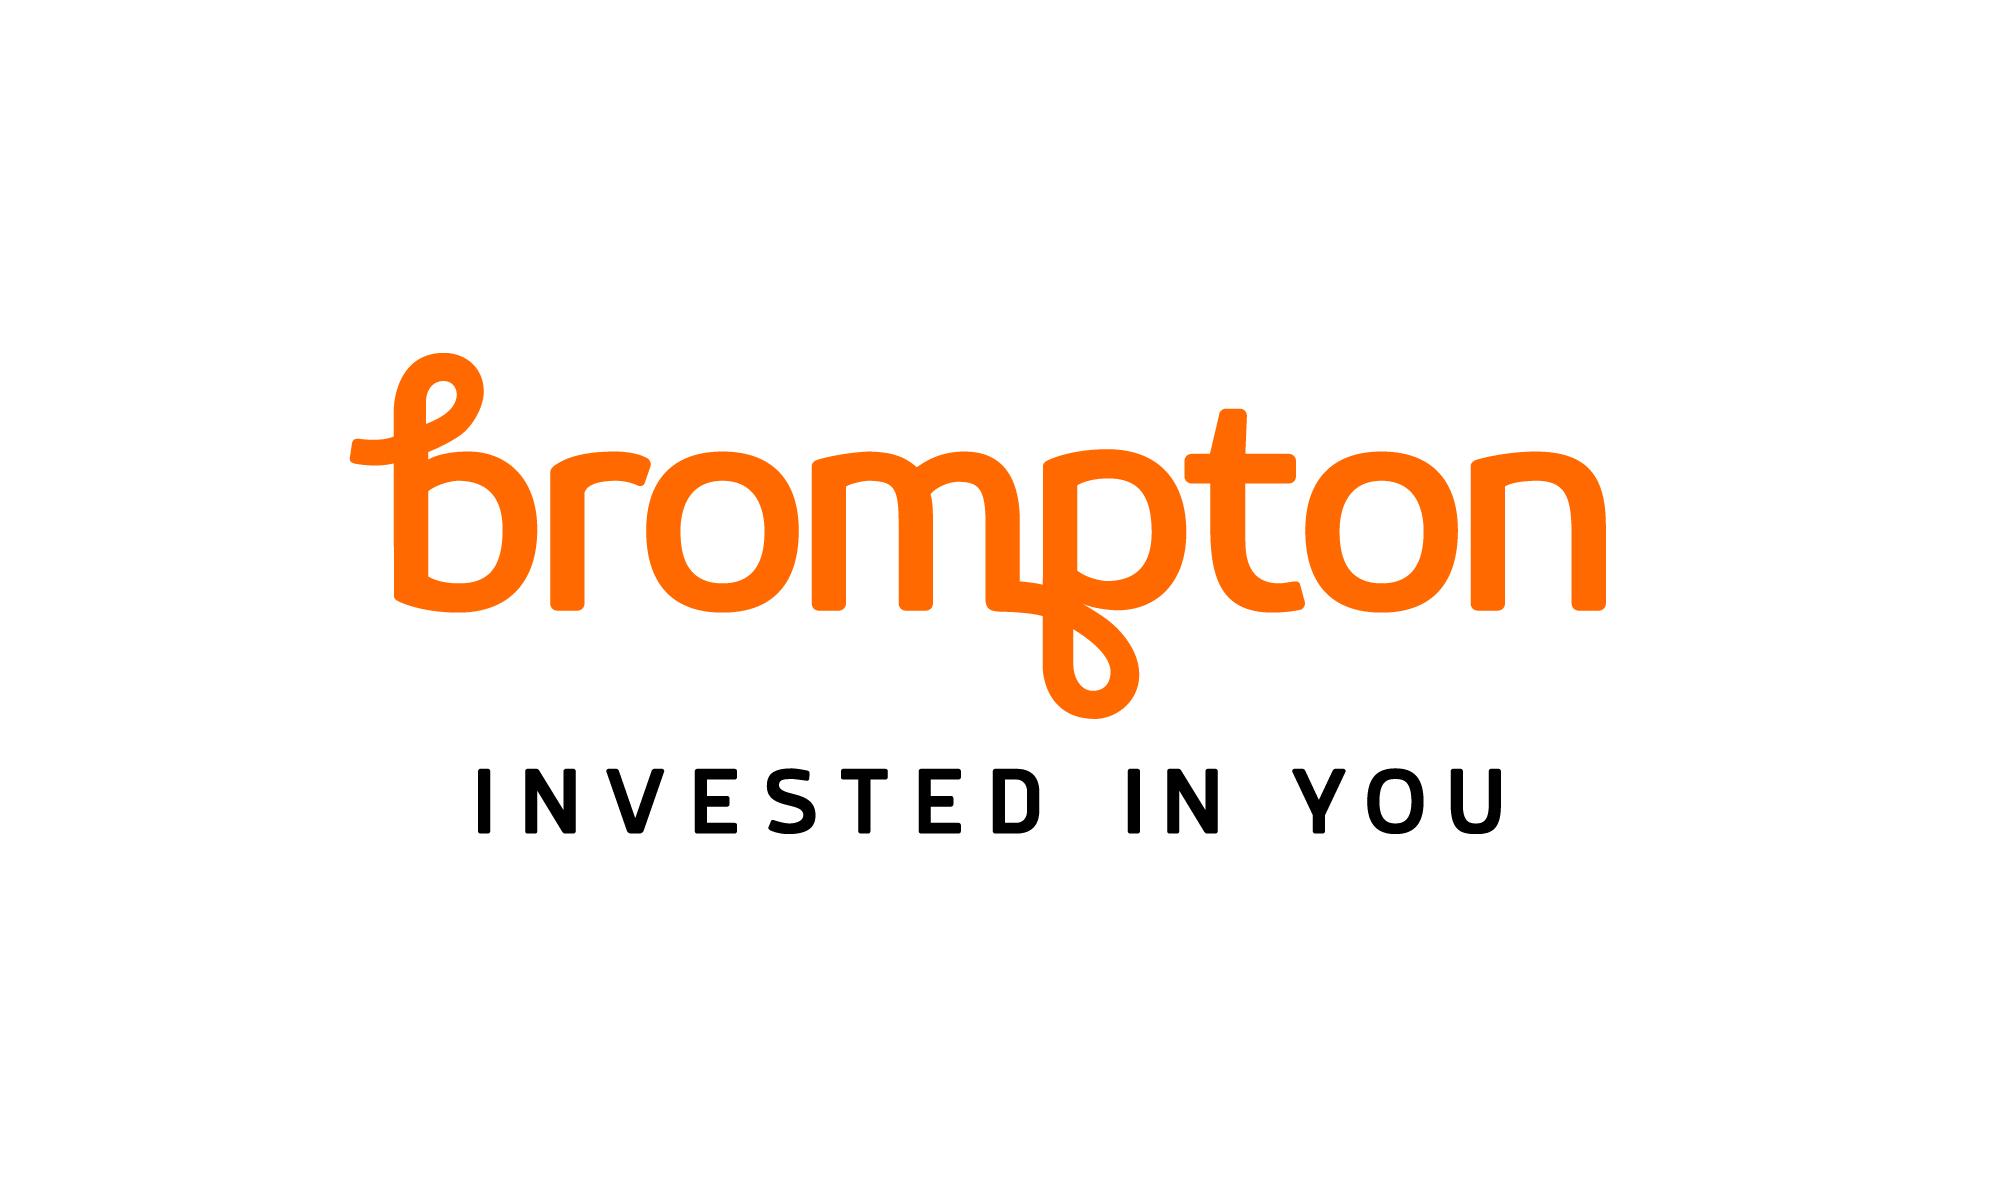 Cover image: Brompton Brand Identity